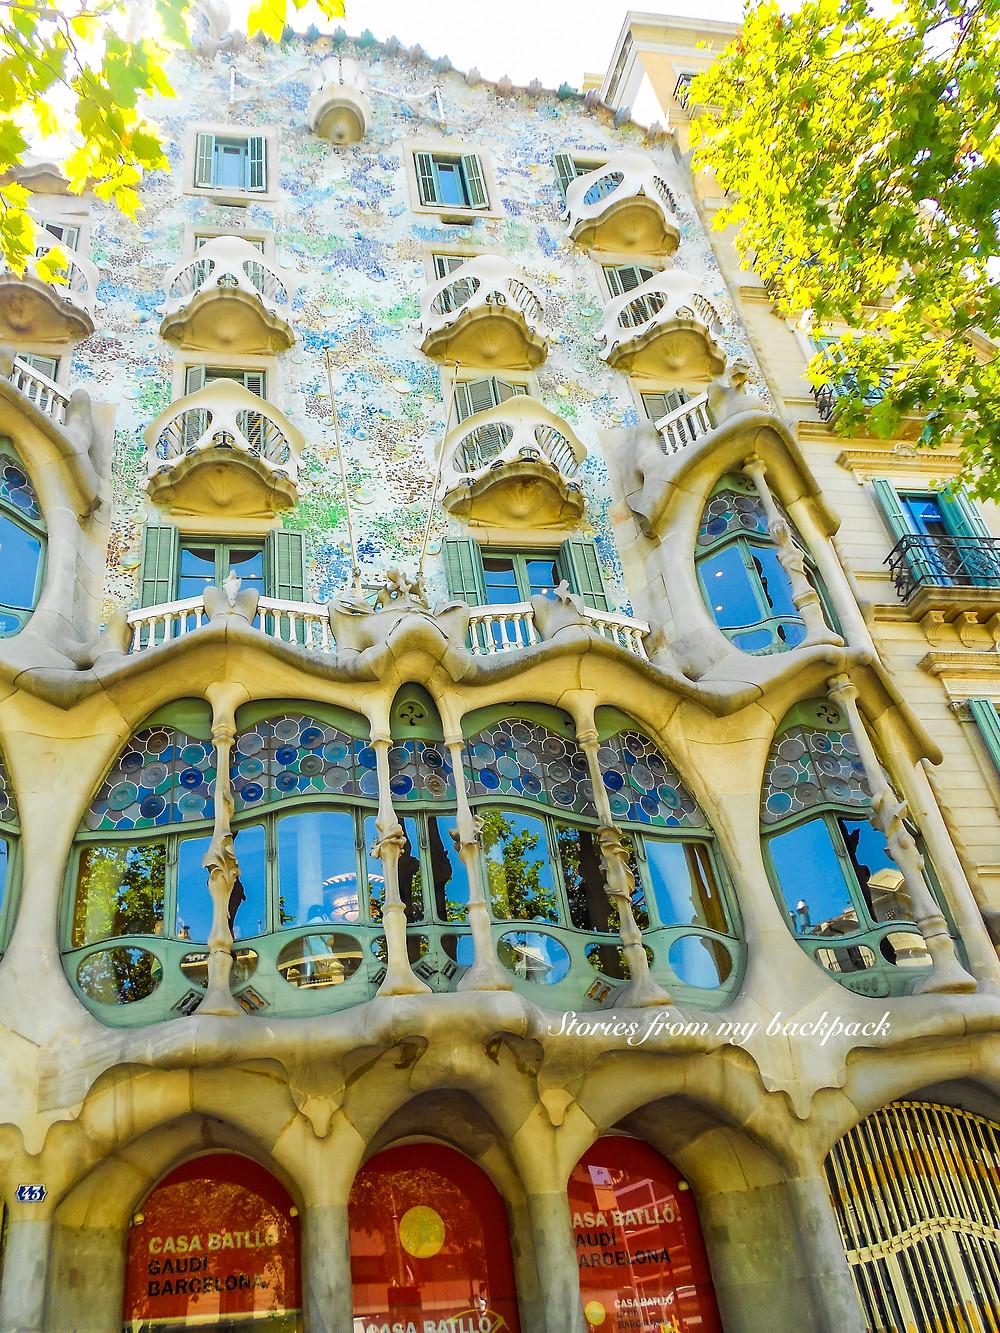 Casa Batllo, Casa Mila, Sagrada Familia, sightseeing in Barcelona, Barcelona things to do, Barcelona hop on hop off bus